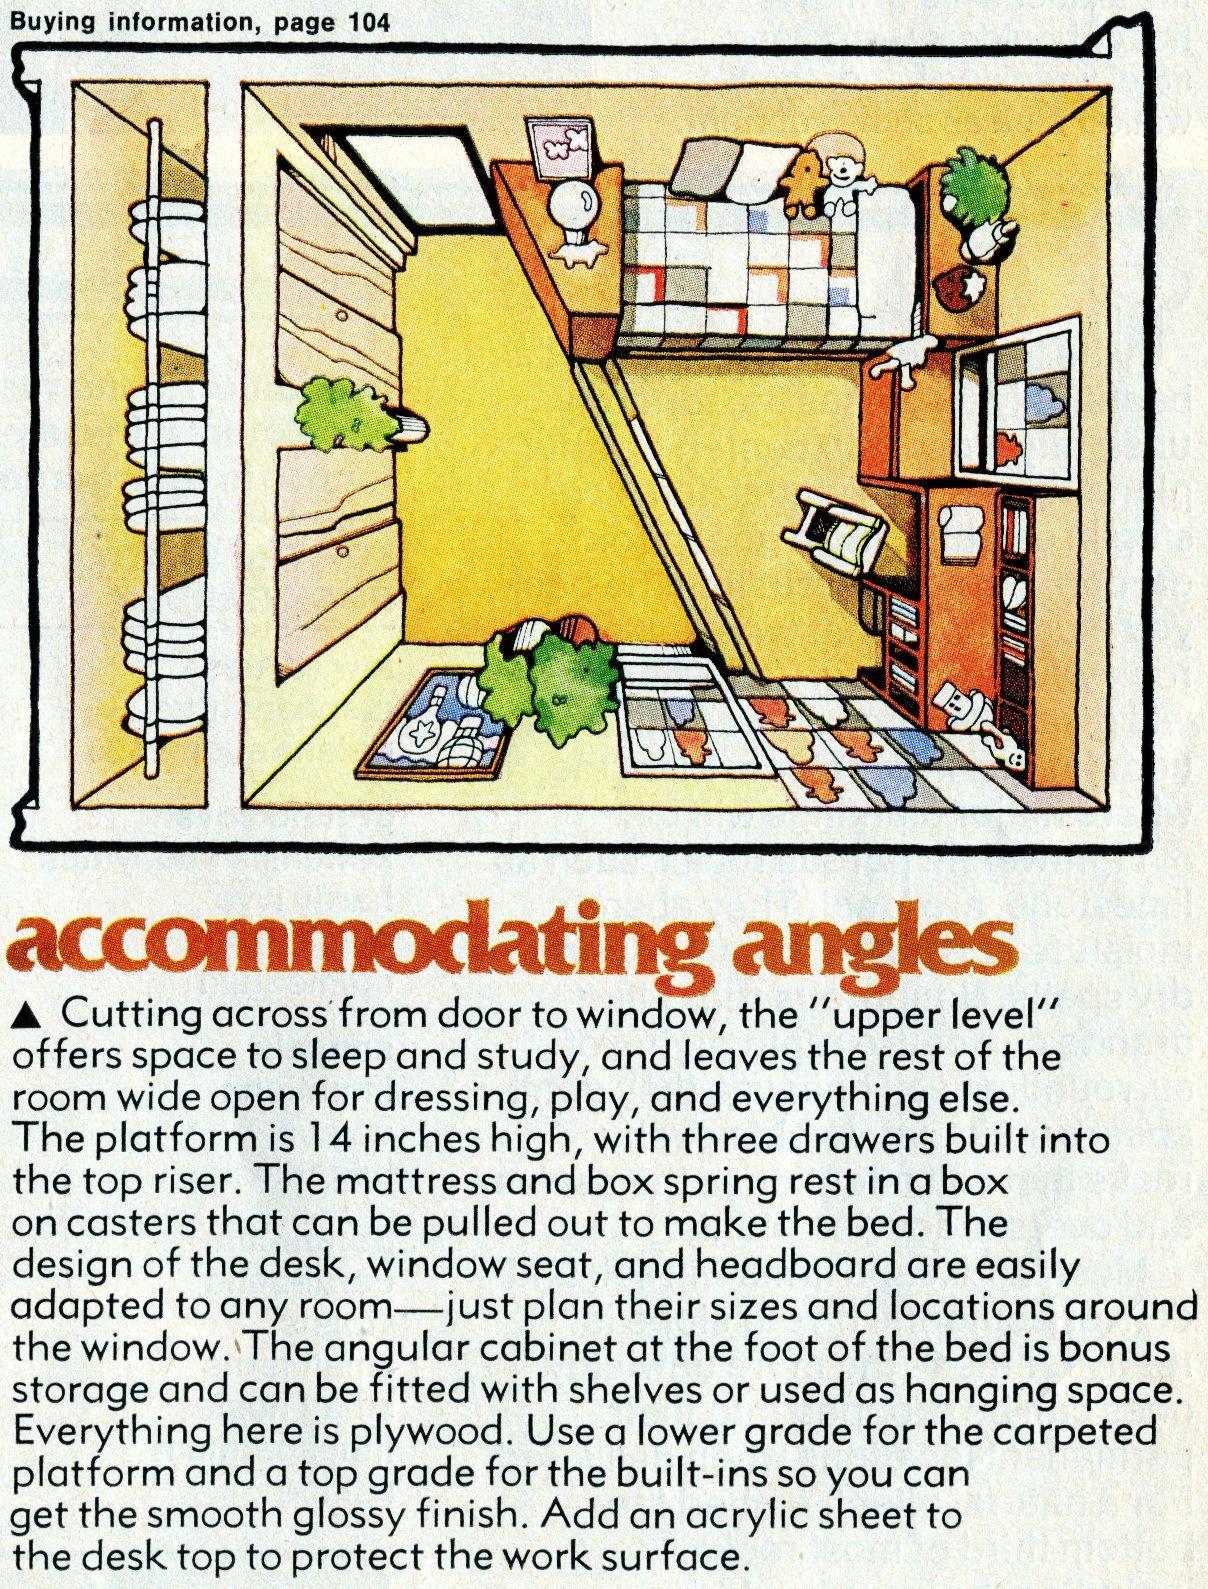 Retro plan view for bedroom with shag carpet platform (1976)